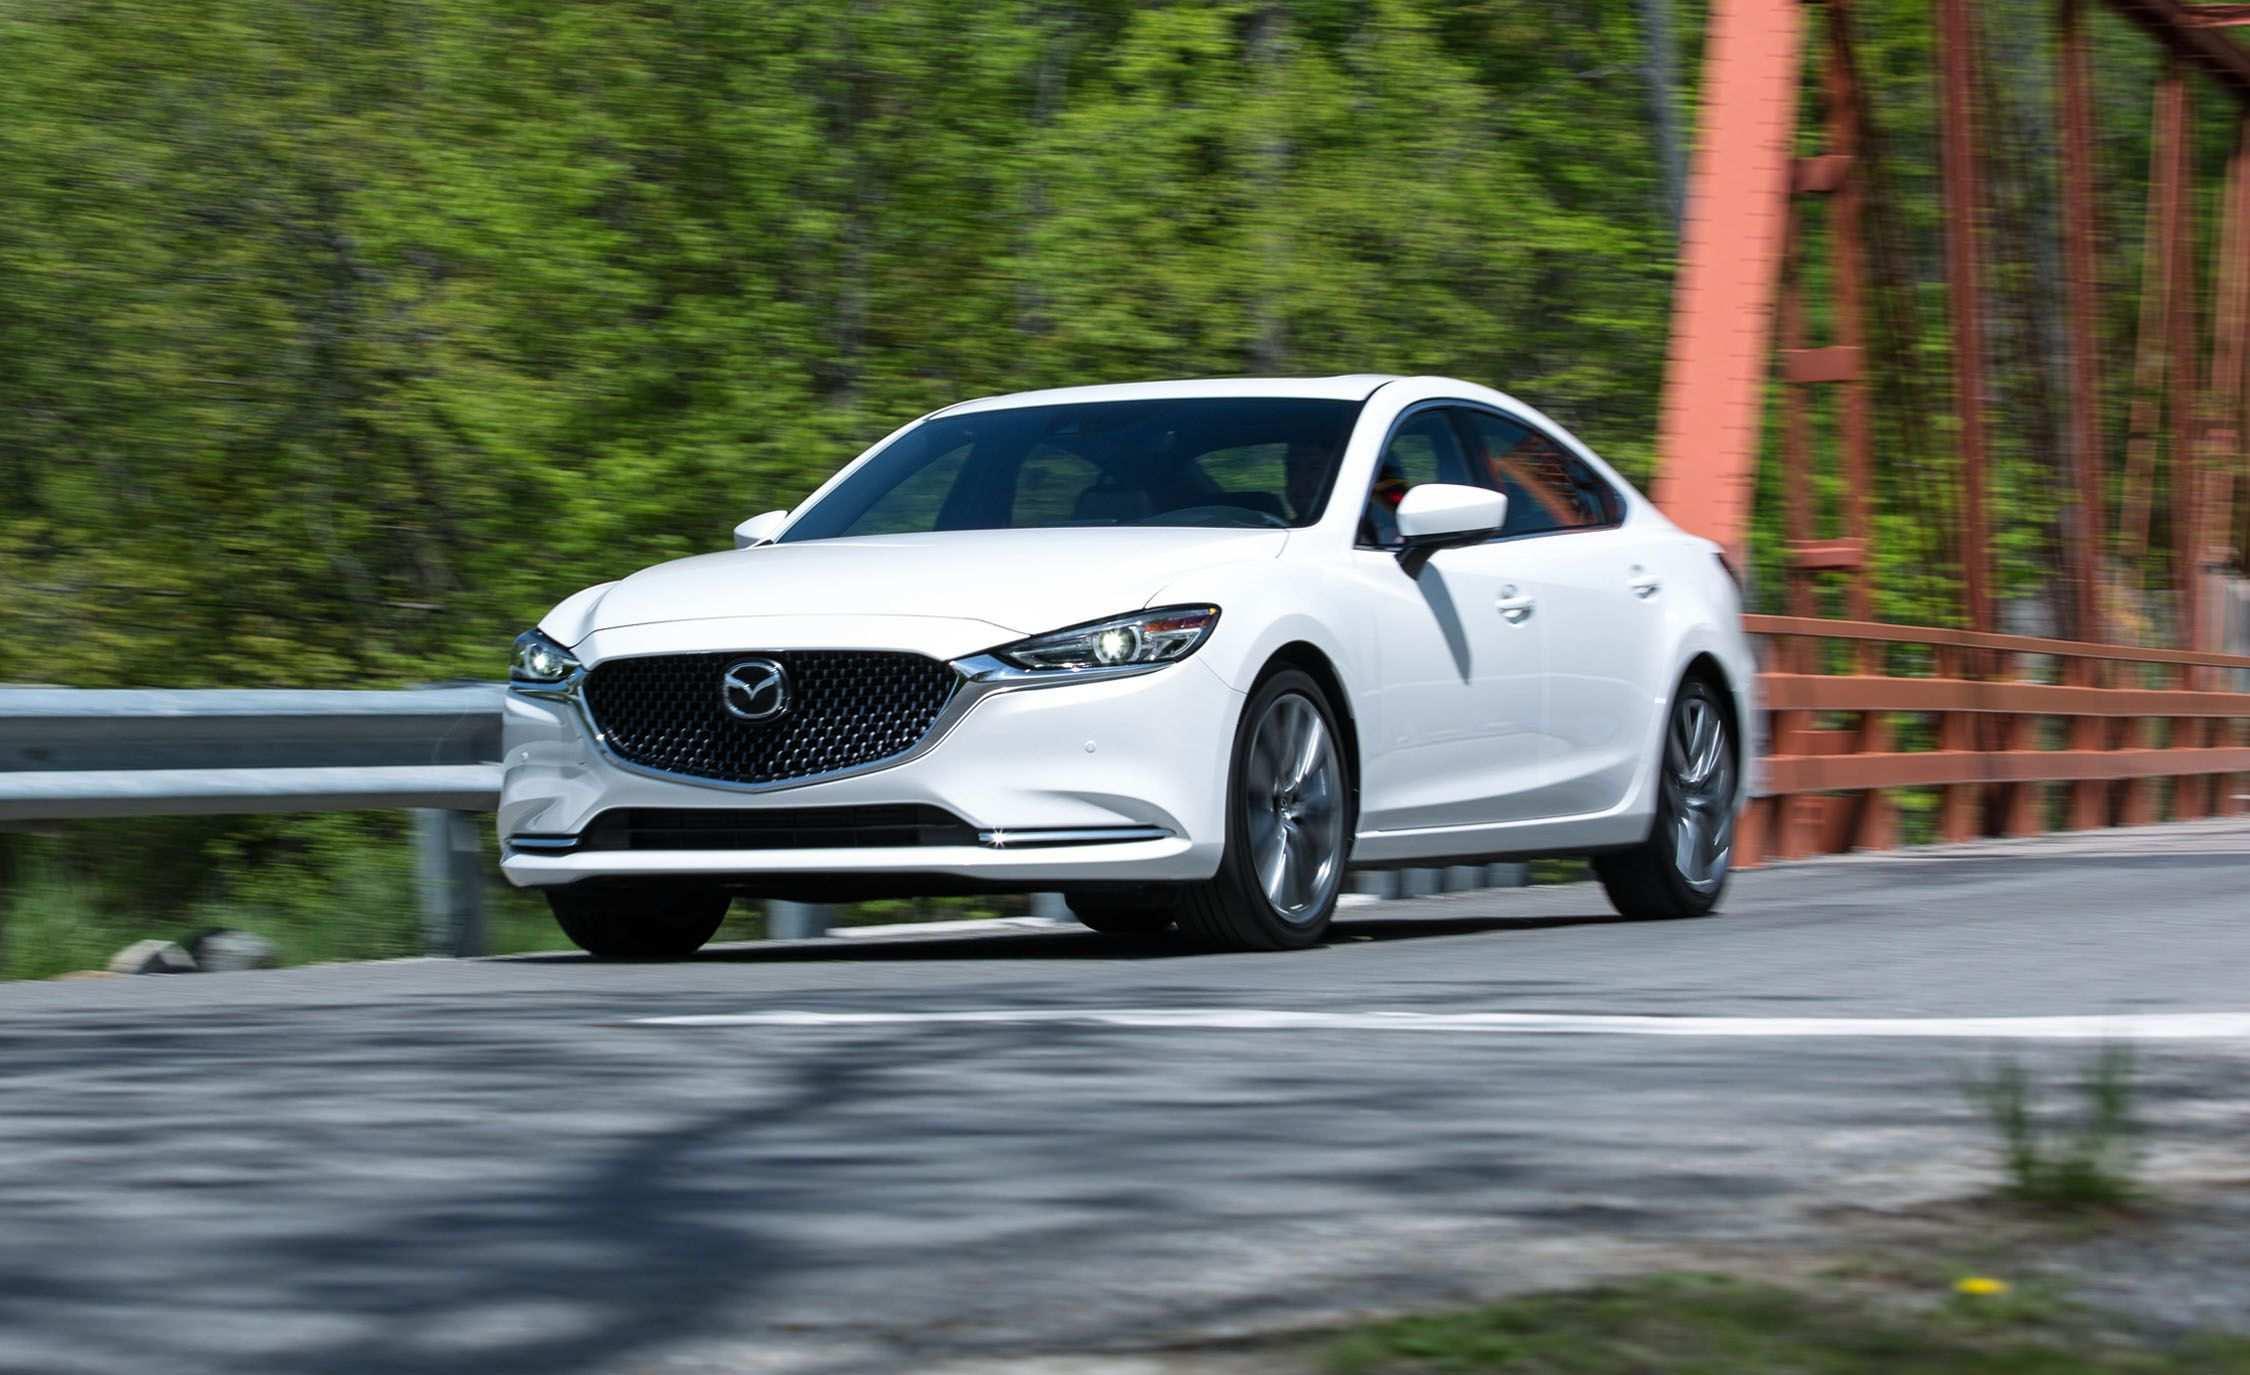 20 Great 2019 Mazda 6 Turbo 0 60 Release with 2019 Mazda 6 Turbo 0 60